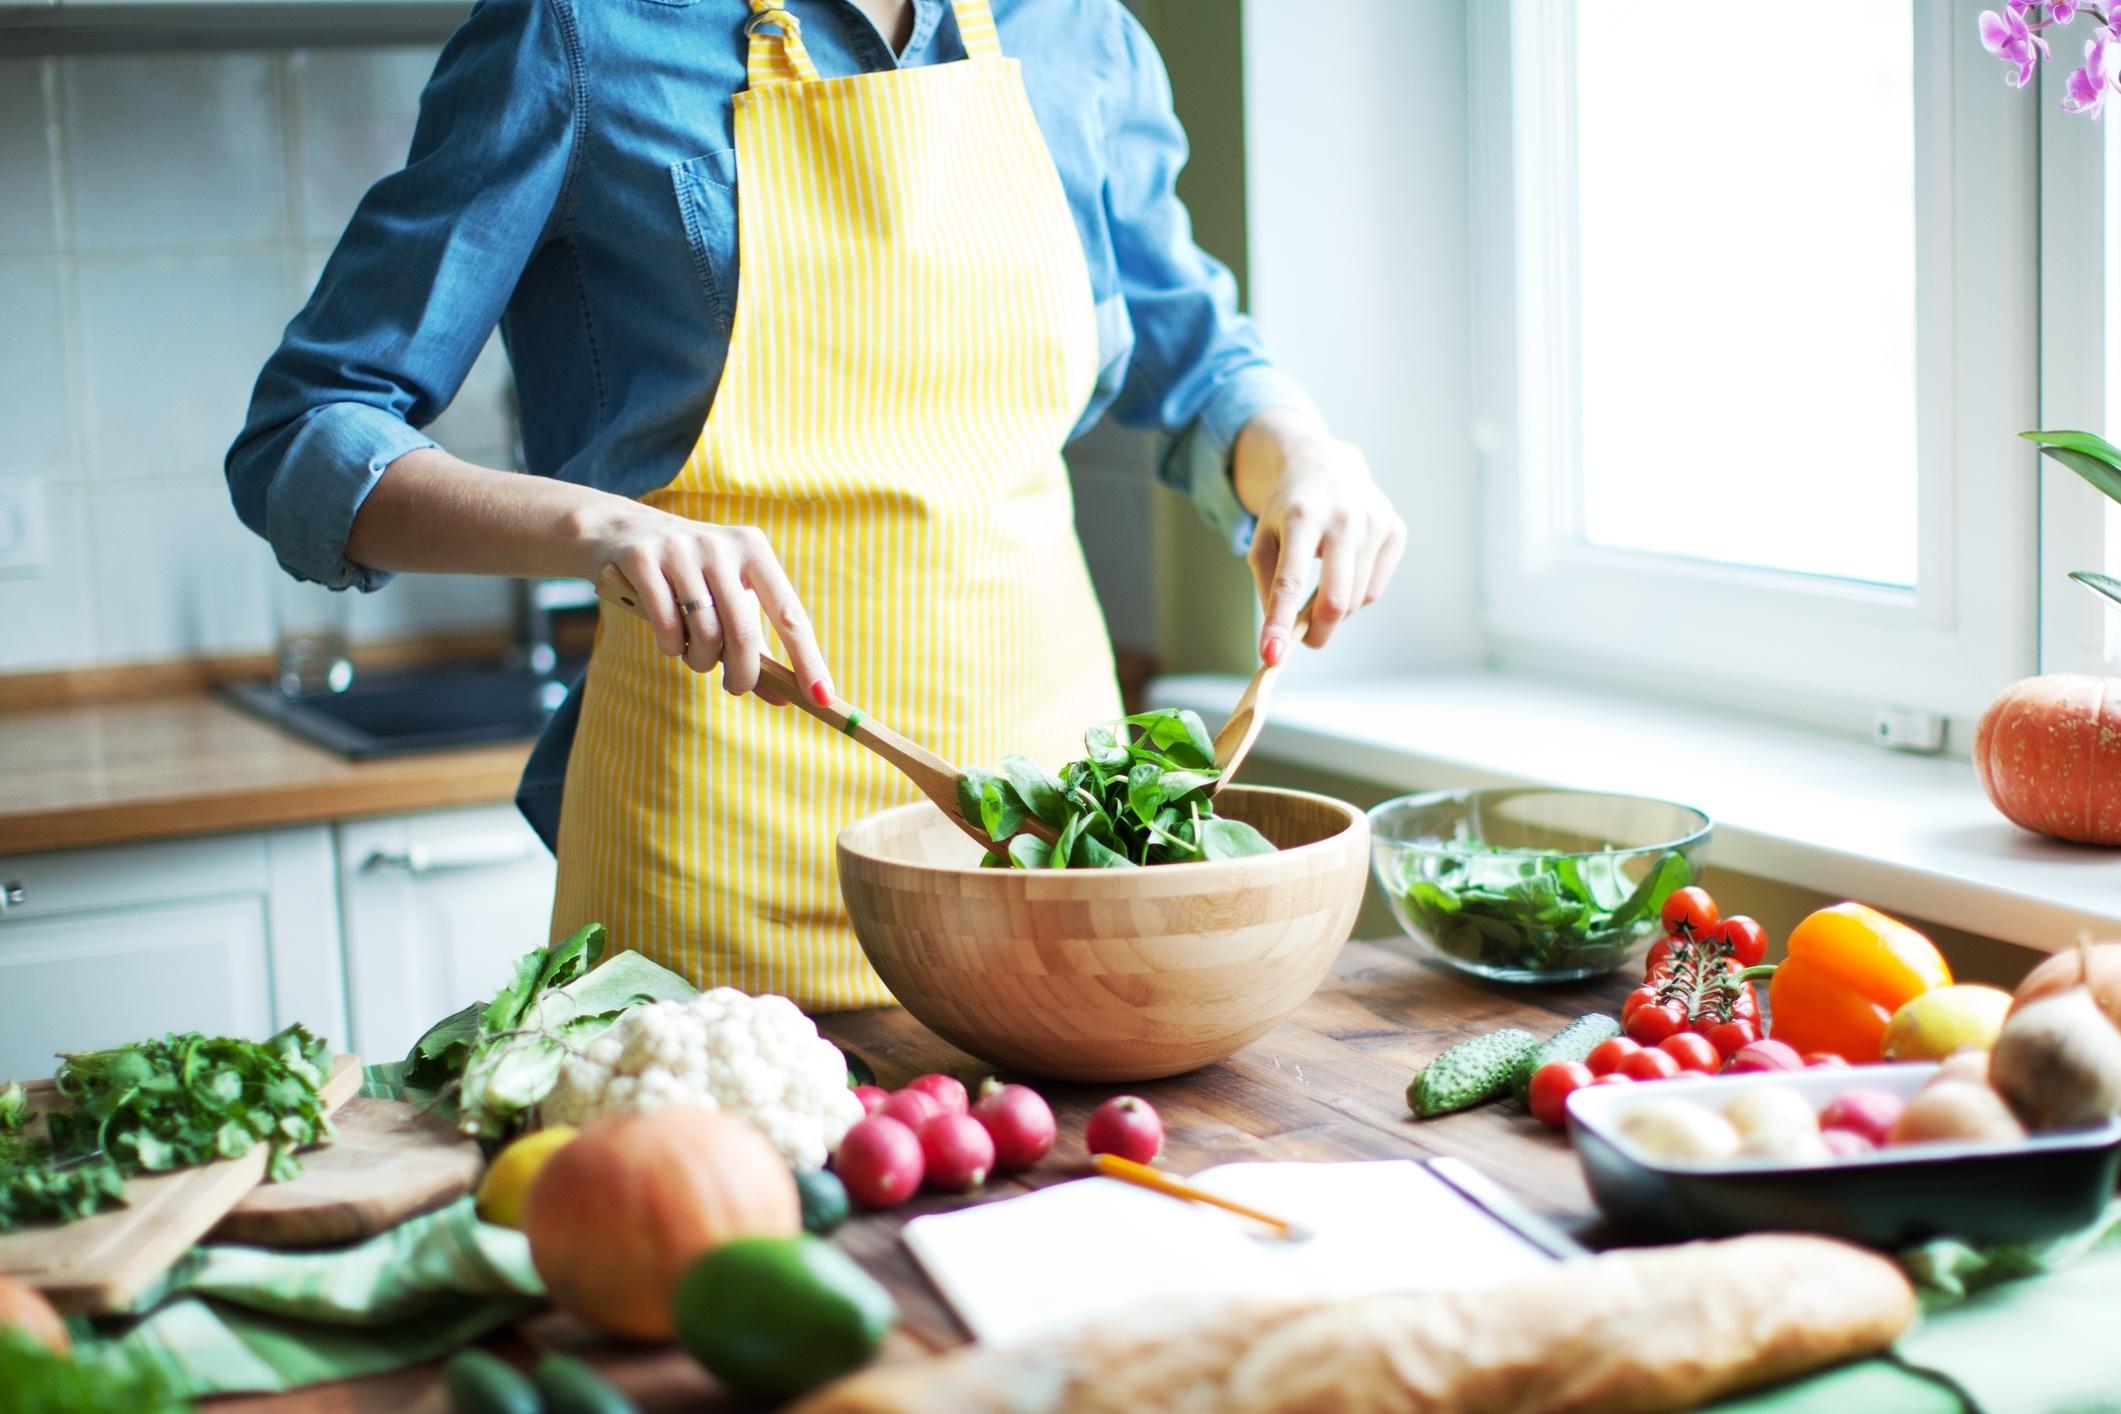 A woman preparing a healthy salad